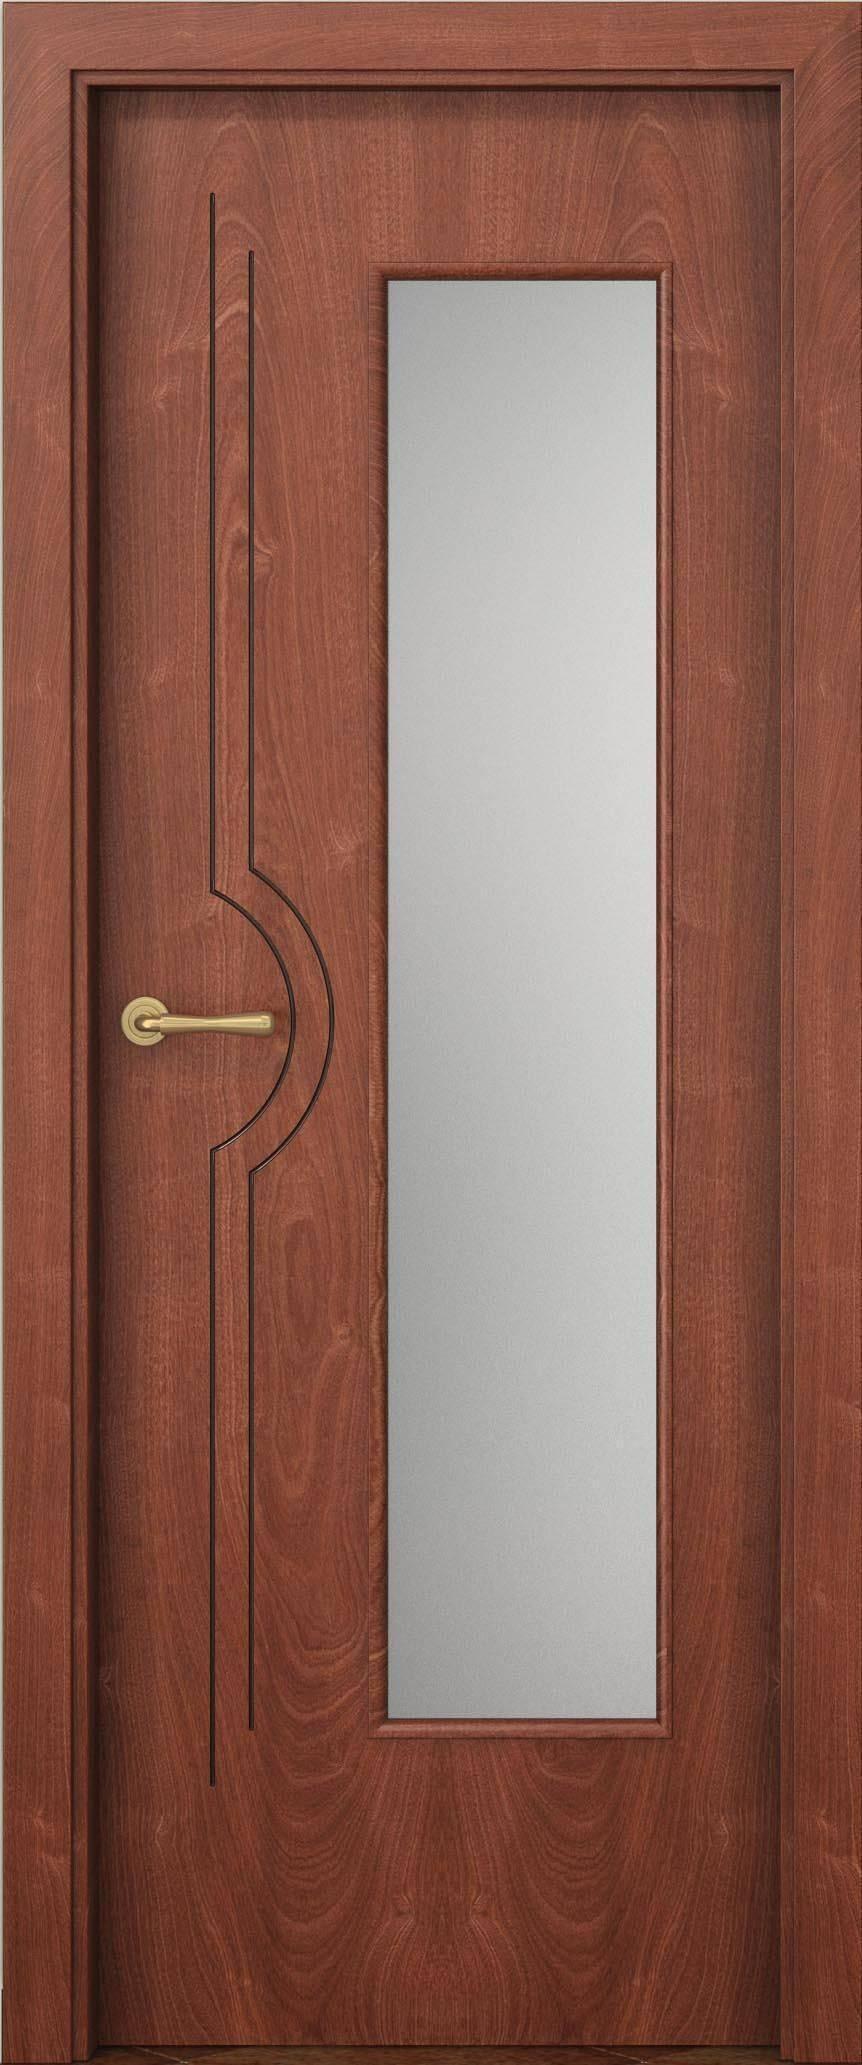 Испанские двери со стеклом